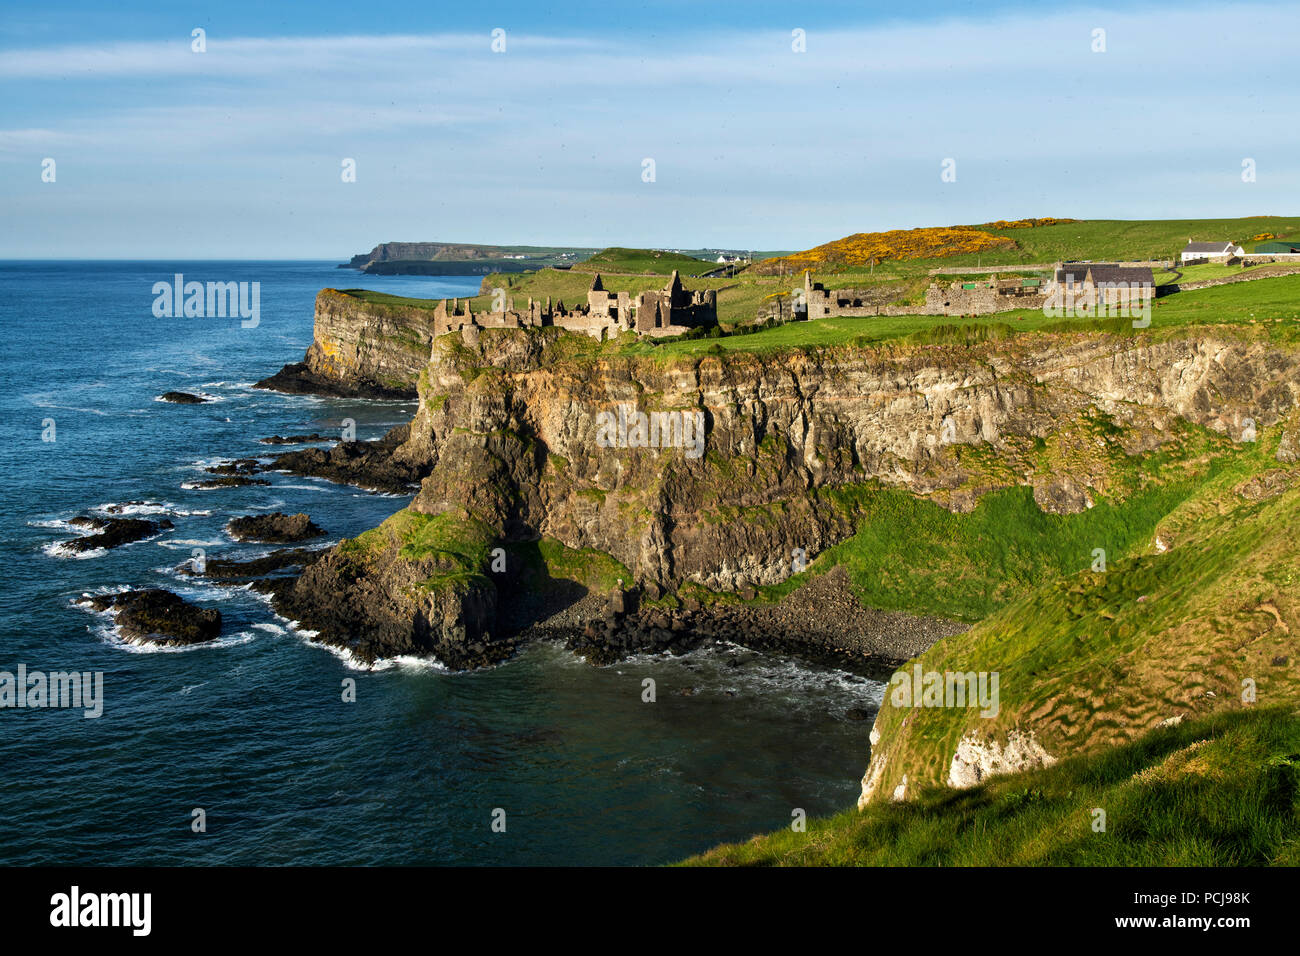 Ruins of Dunluce castle on the Irish coast - Stock Image